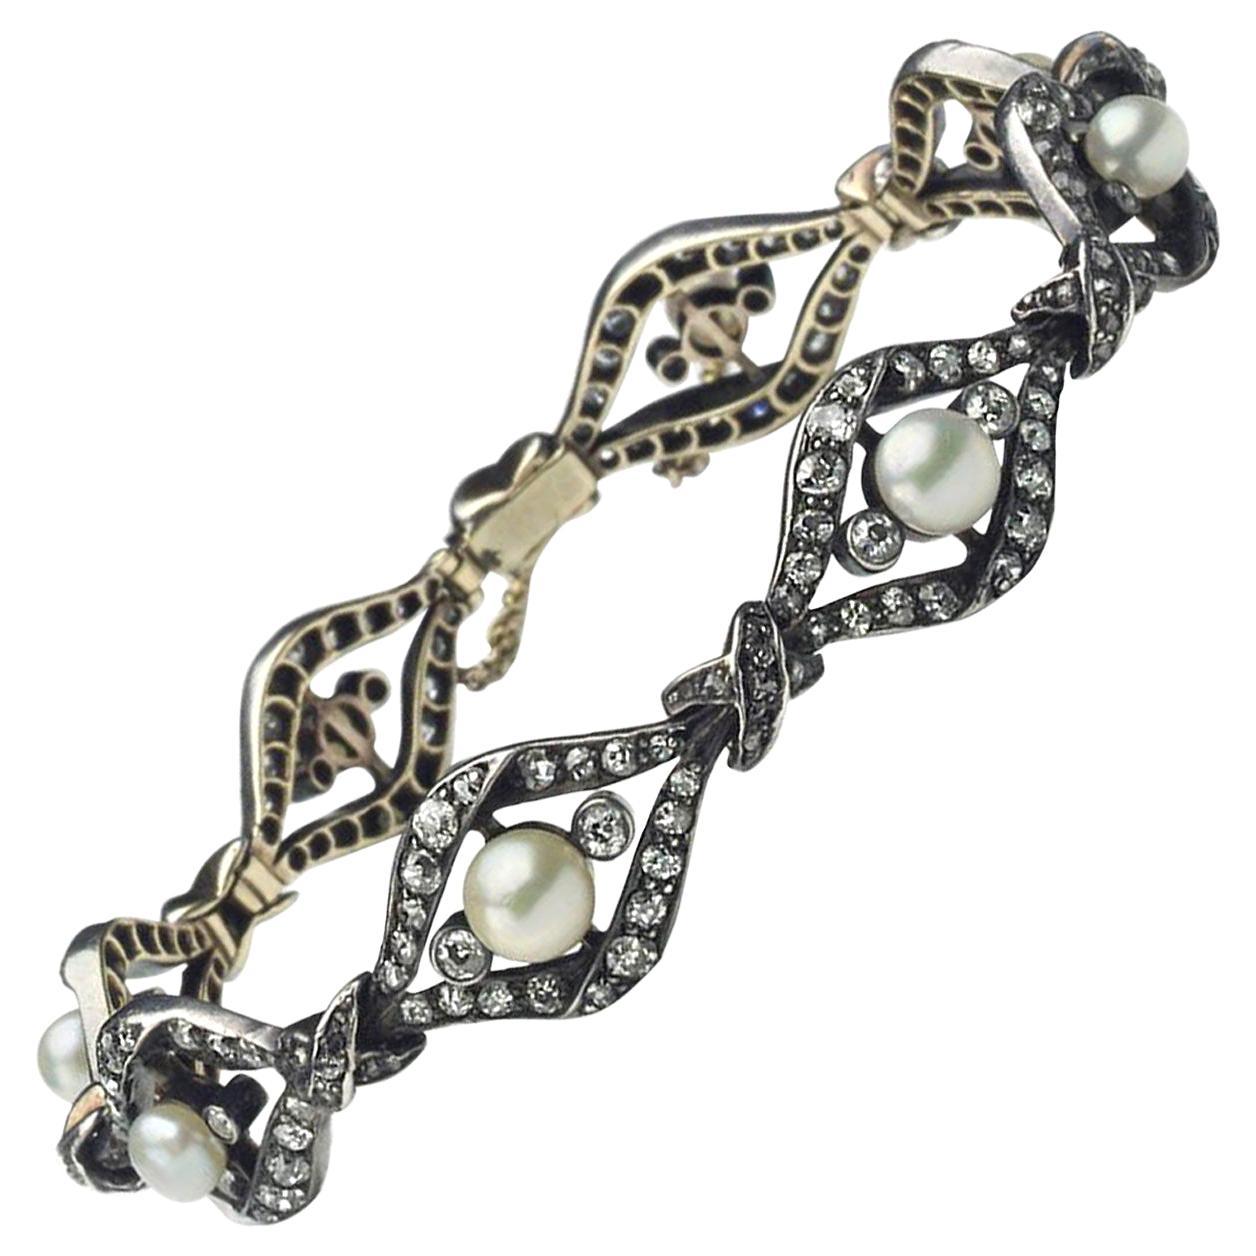 Antique Diamond and Pearl Bracelet